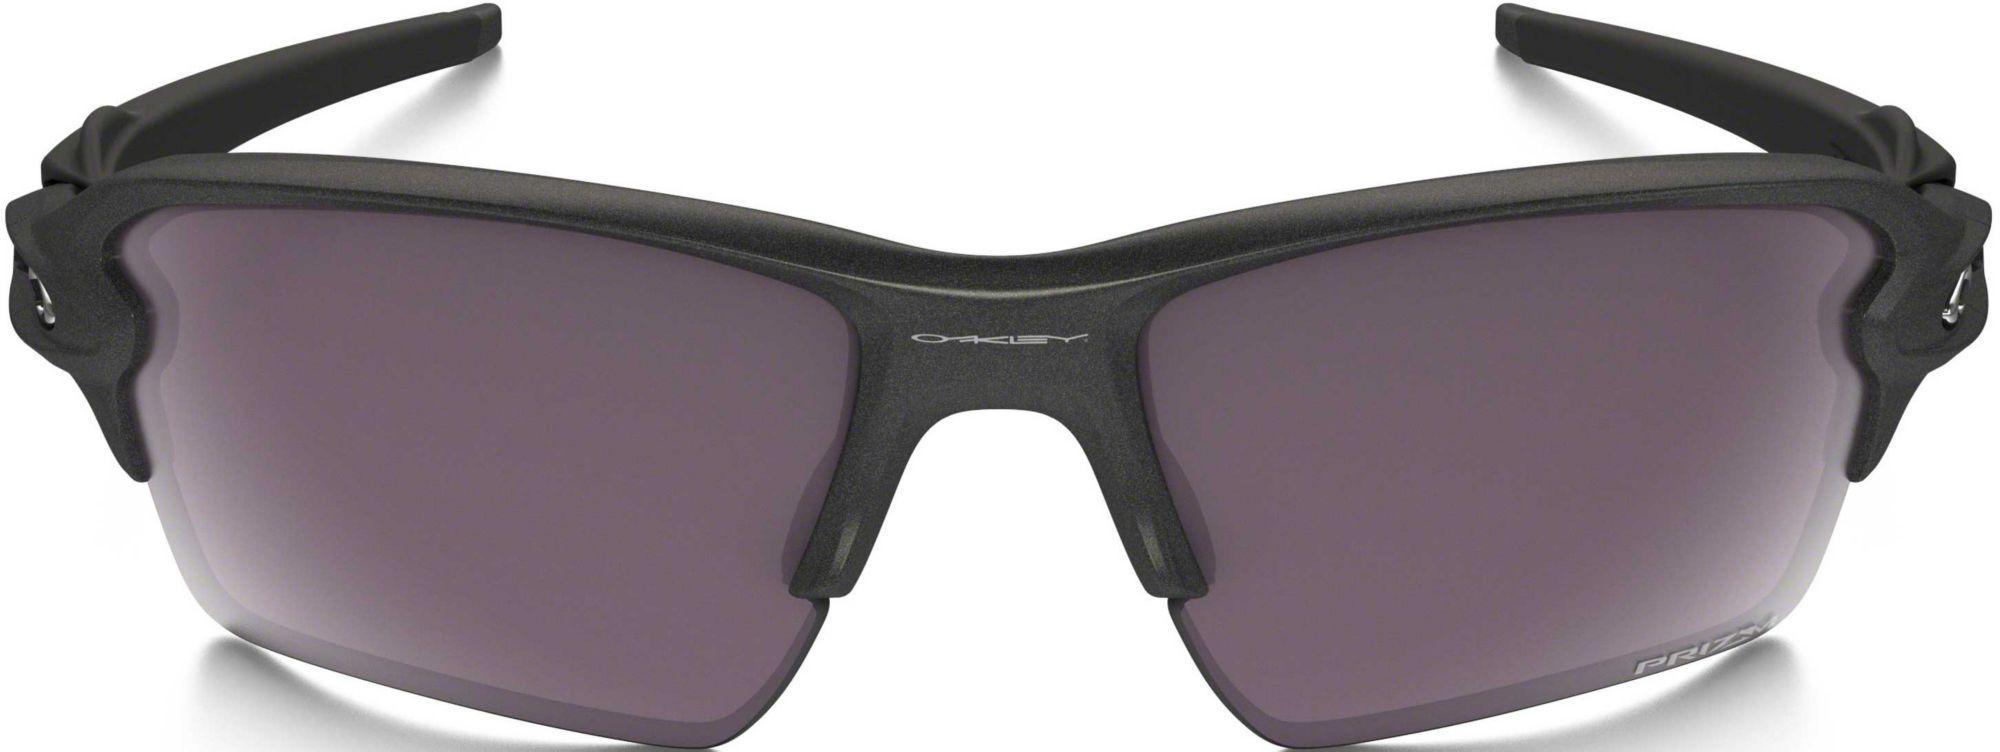 1ae2f53dd5 Oakley - Multicolor Flak 2.0 Xl Prizm Daily Polarized Sunglasses for Men -  Lyst. View fullscreen